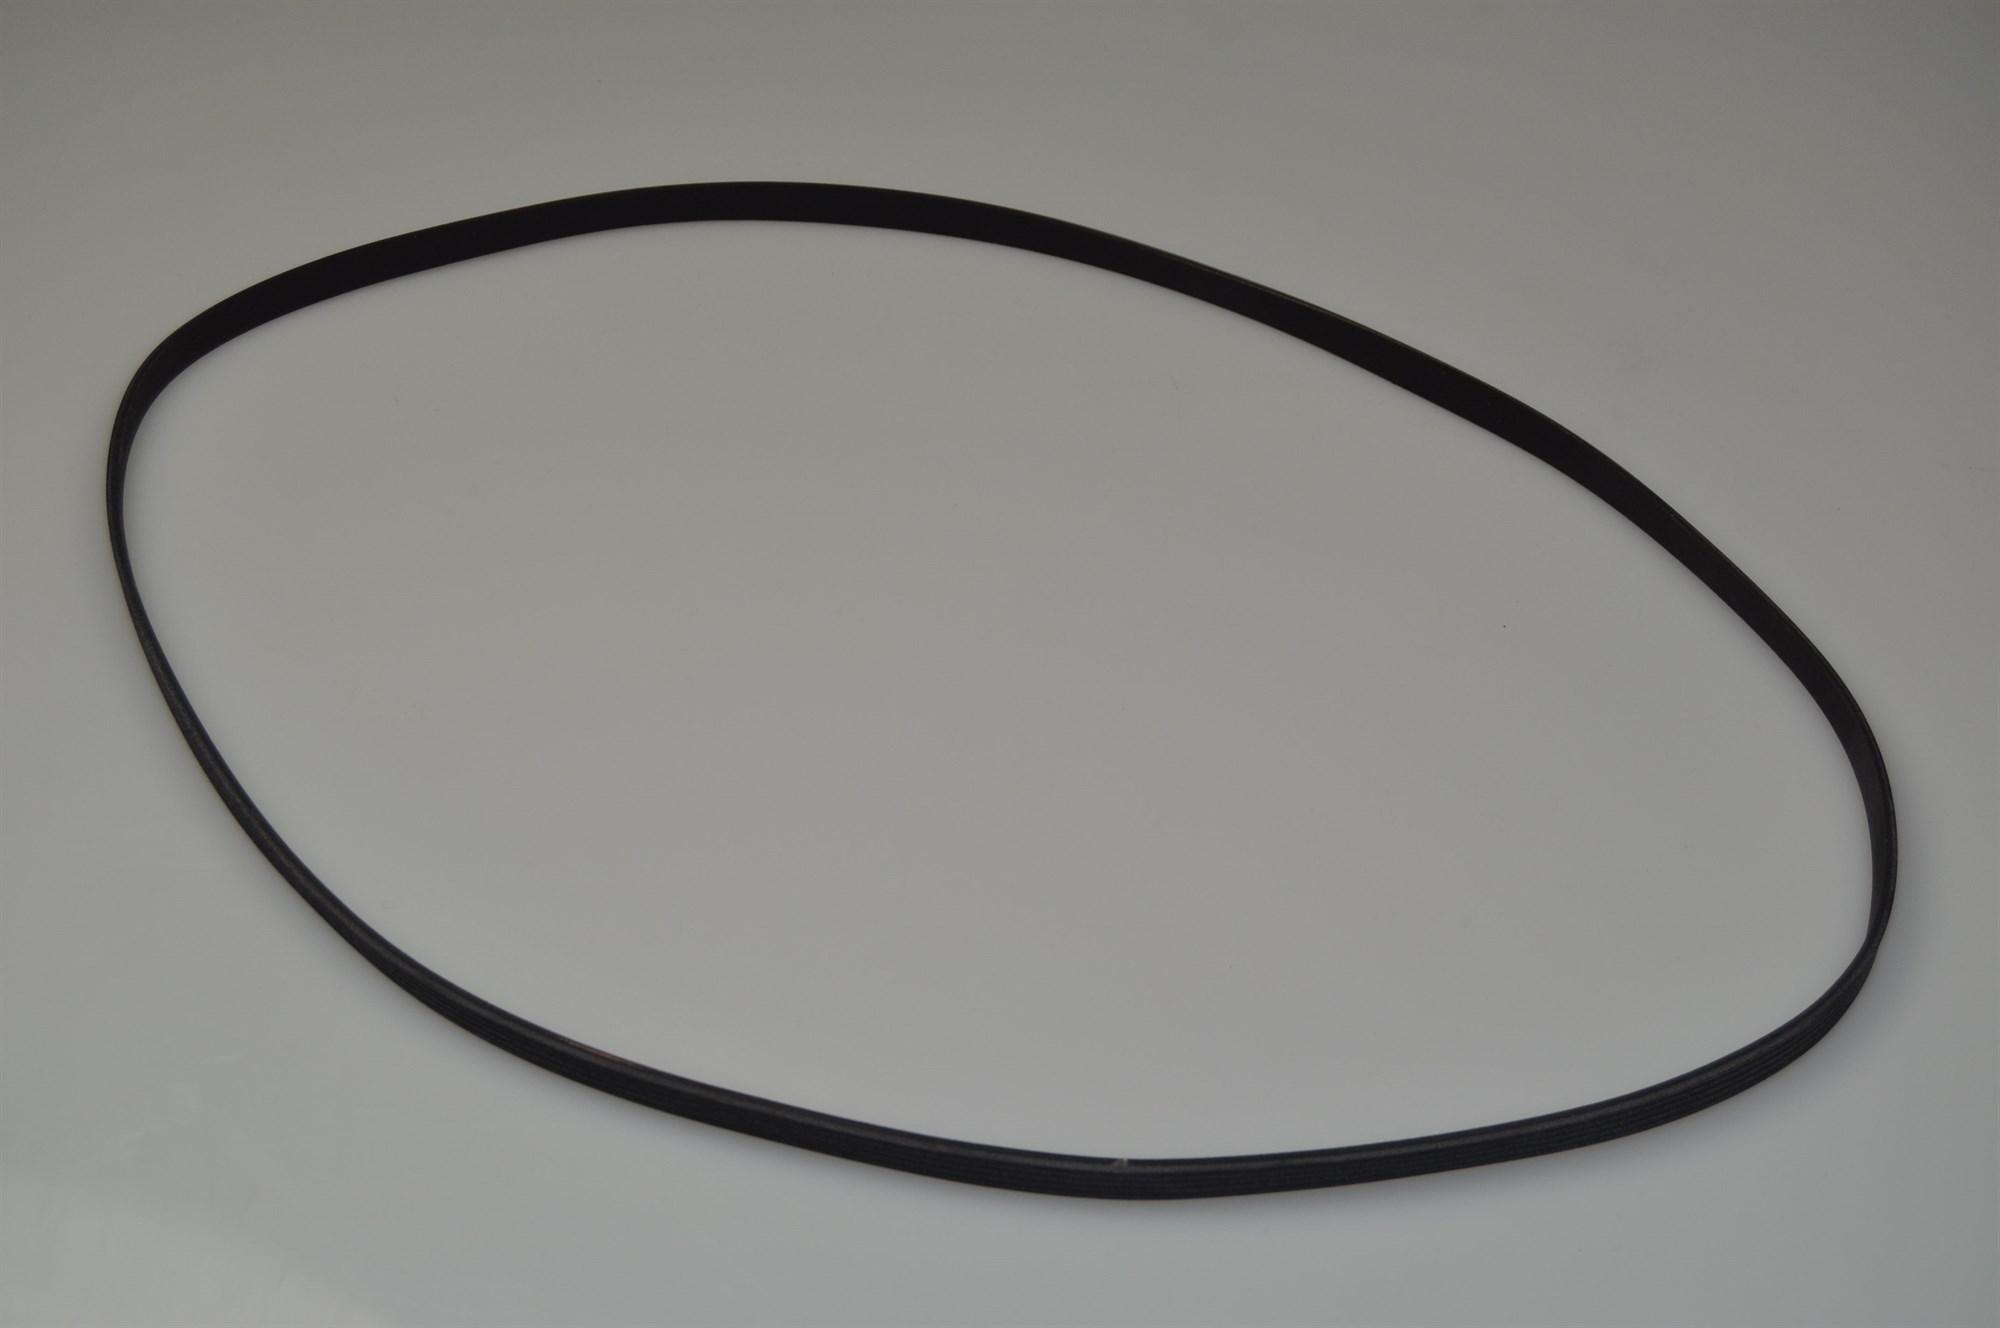 courroie whirlpool lave linge 1238 1239 5pje. Black Bedroom Furniture Sets. Home Design Ideas